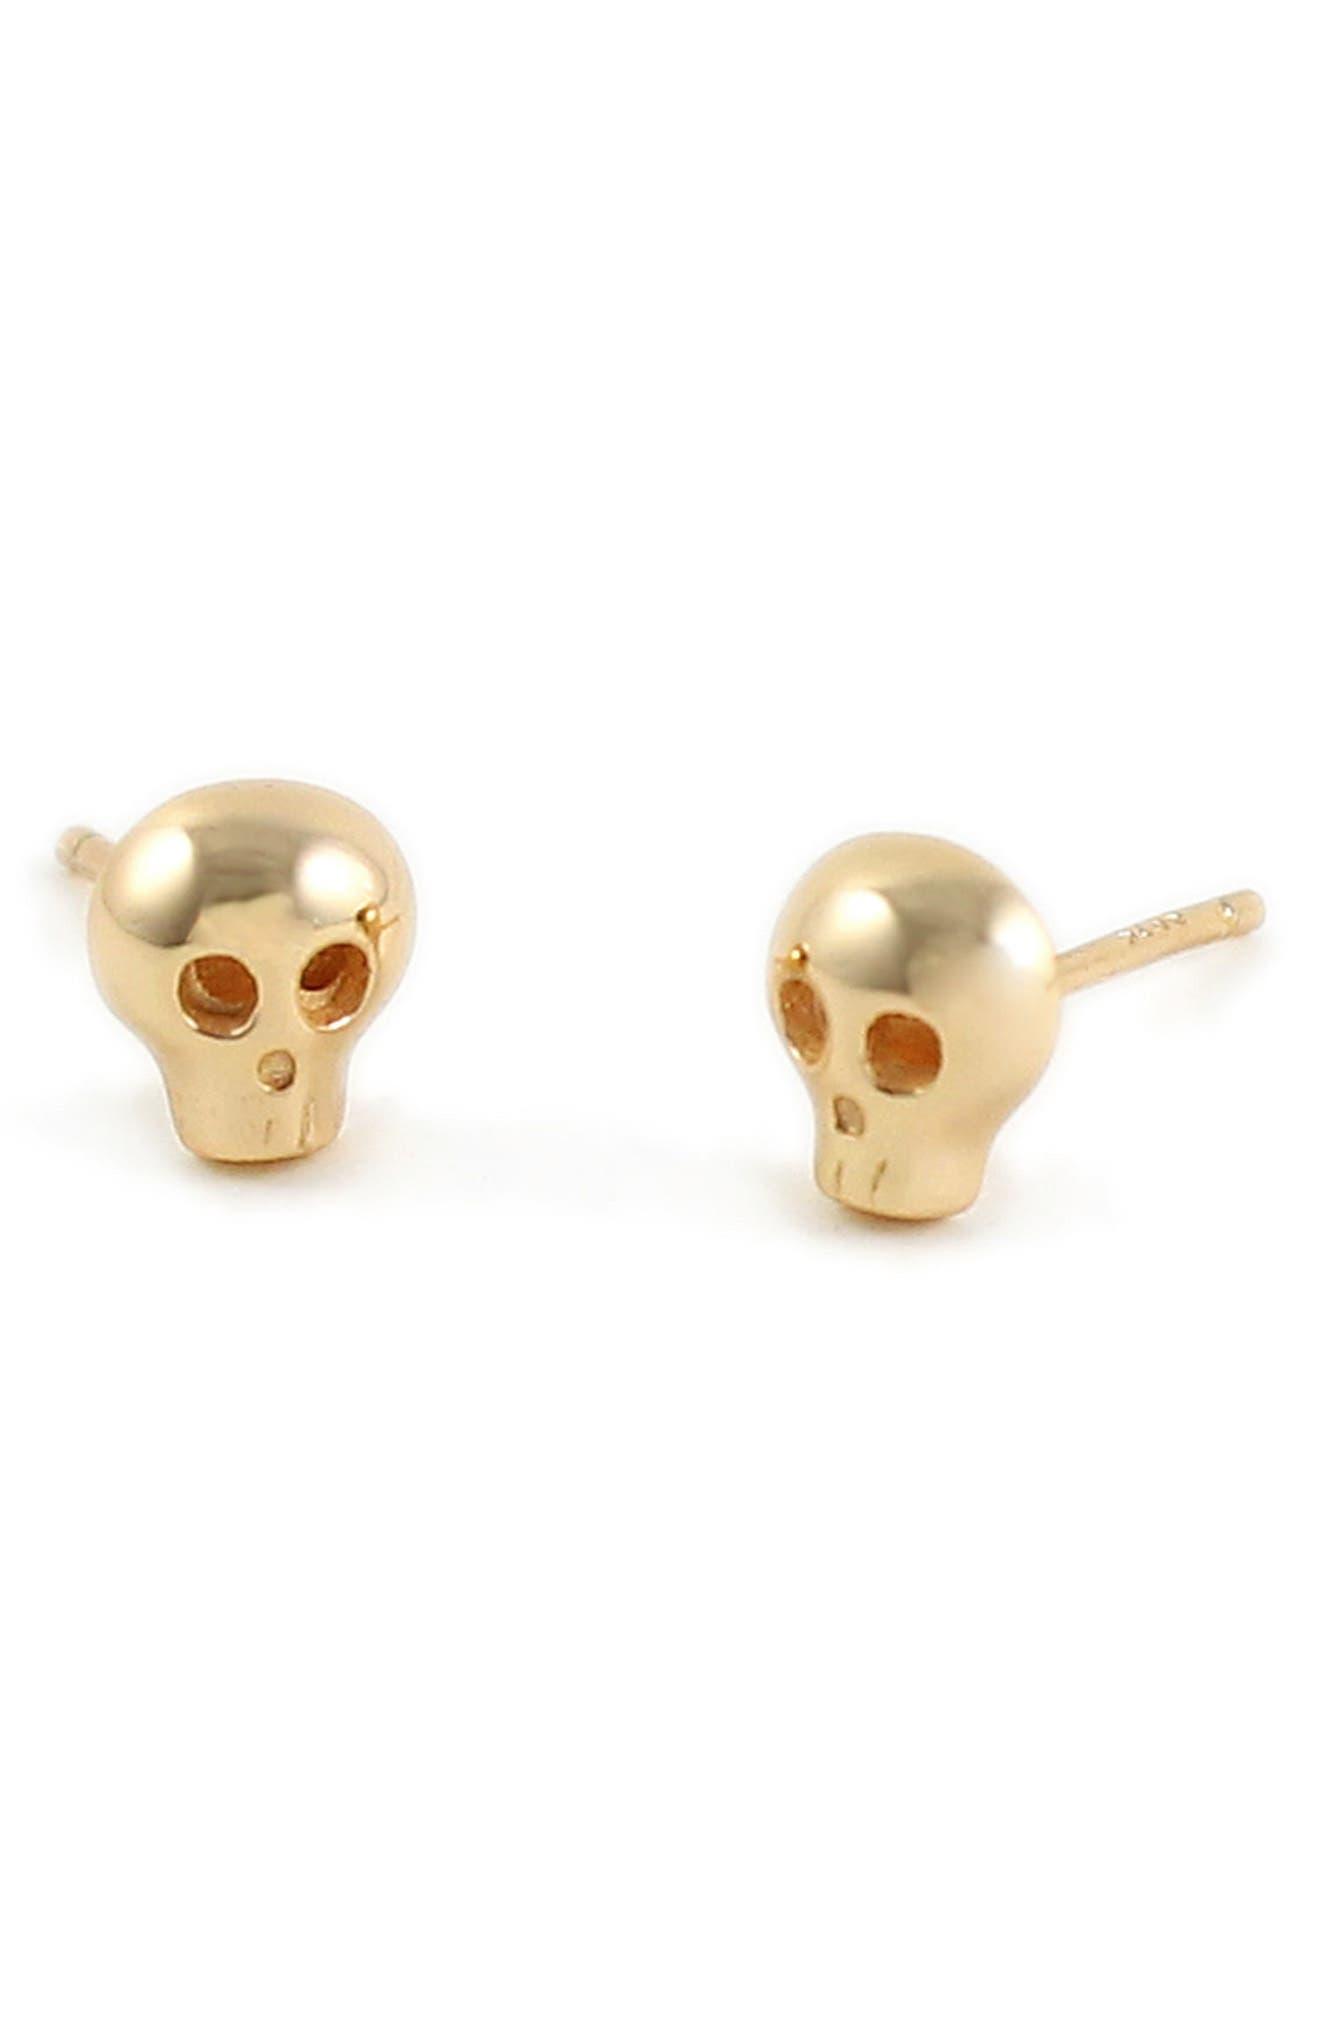 Skull Stud Earrings,                             Main thumbnail 1, color,                             Gold